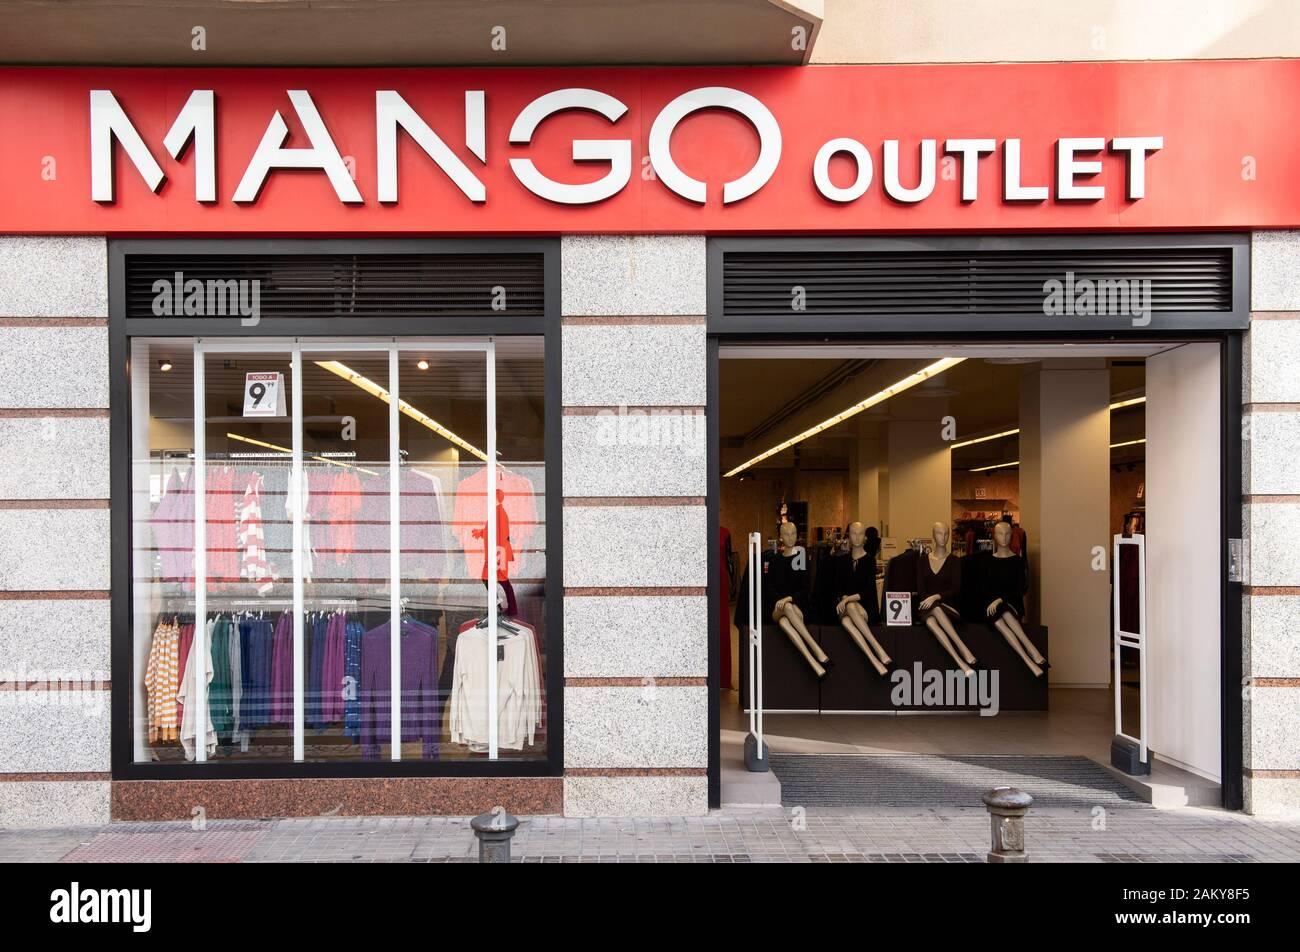 Mango Outlet Stock Photos Mango Outlet Stock Images Alamy